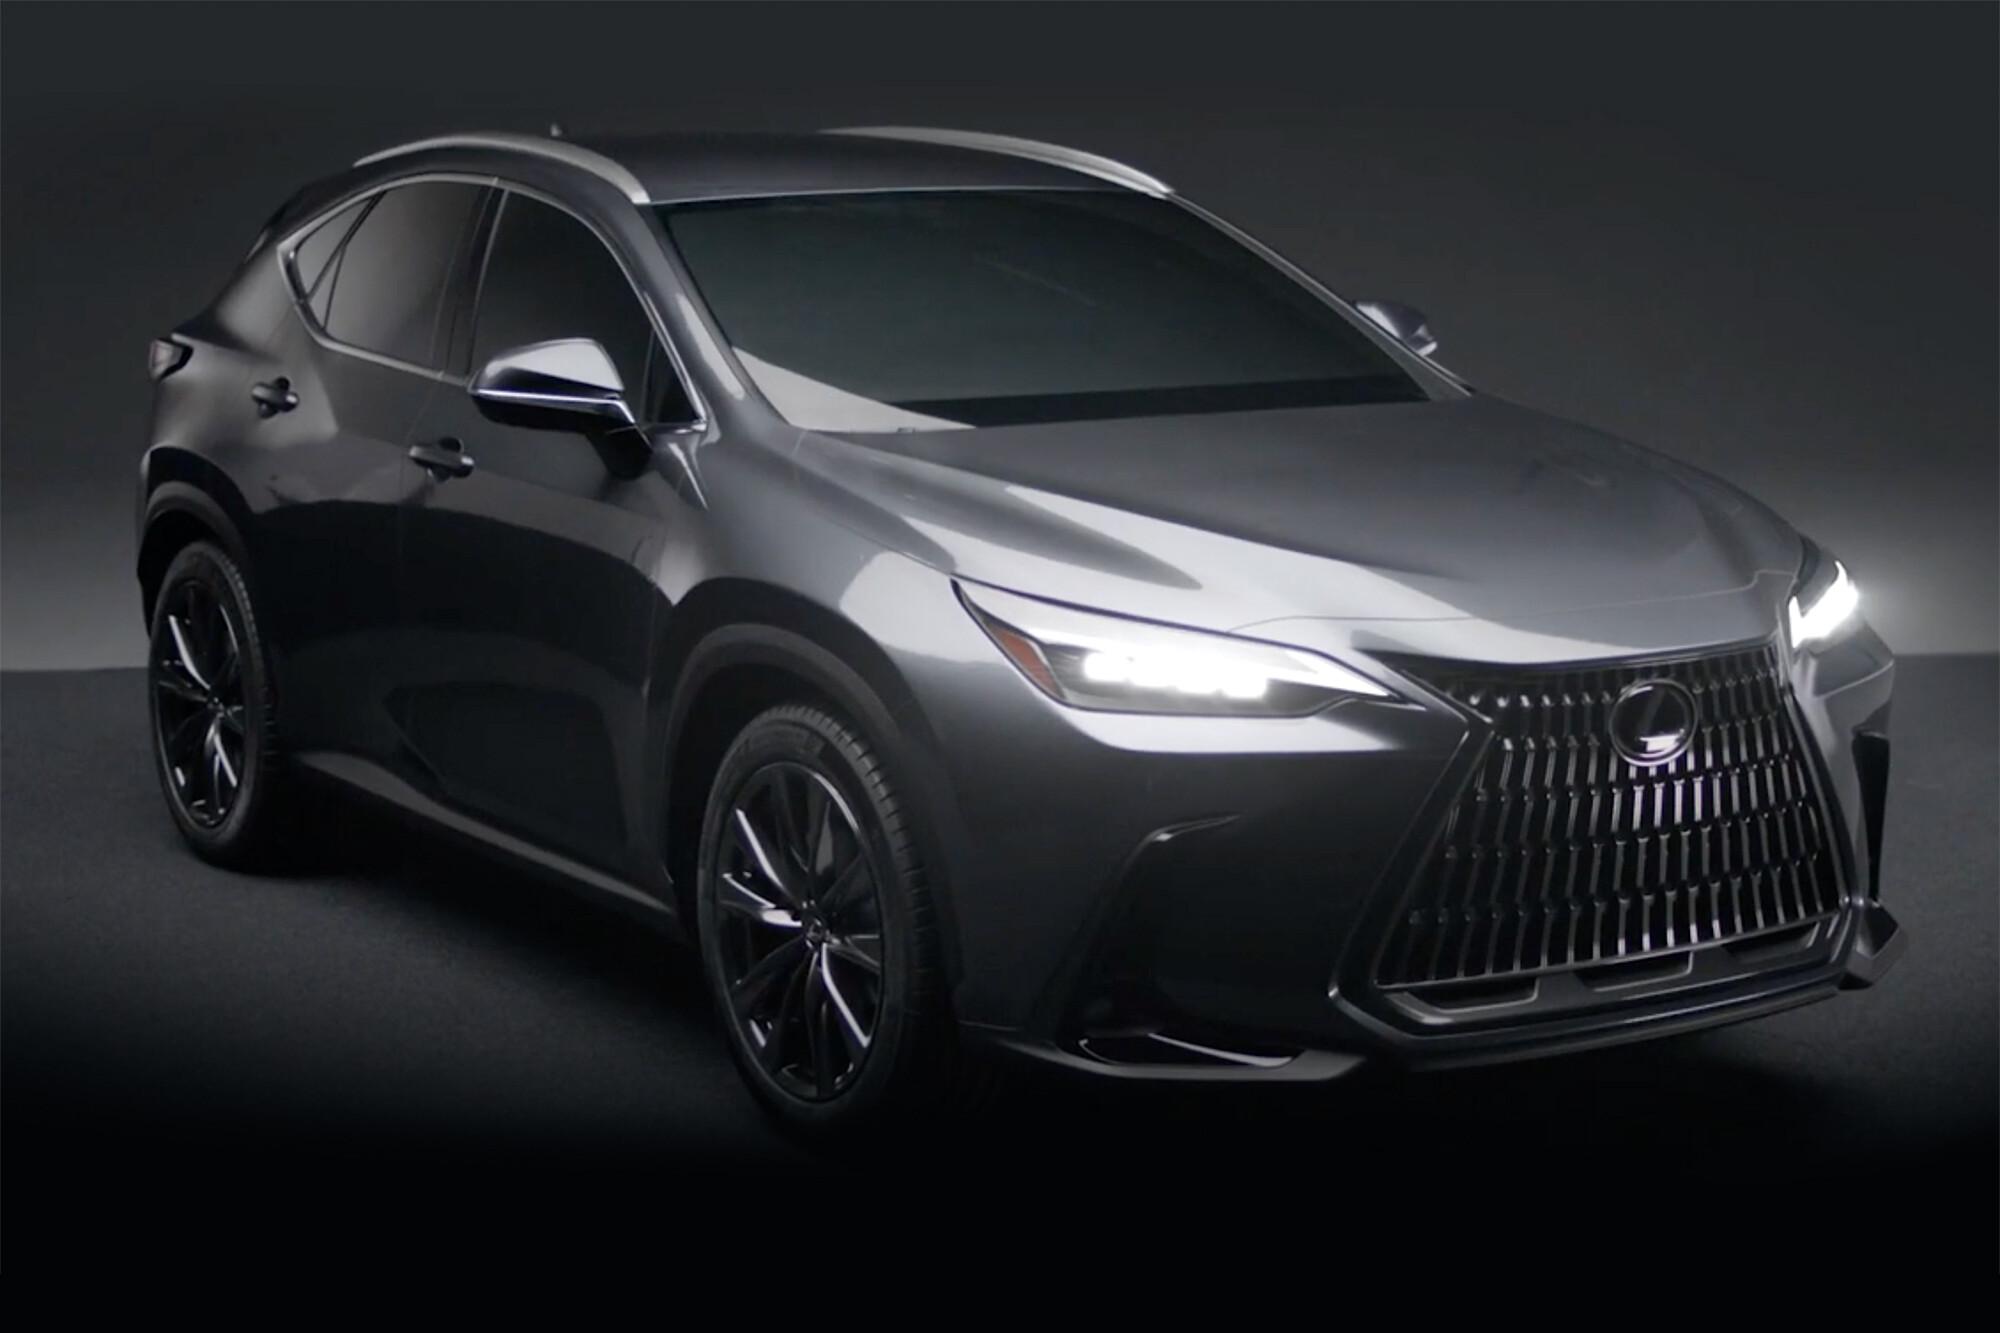 2022 Lexus Nx Suv Revealed 07 Jpg